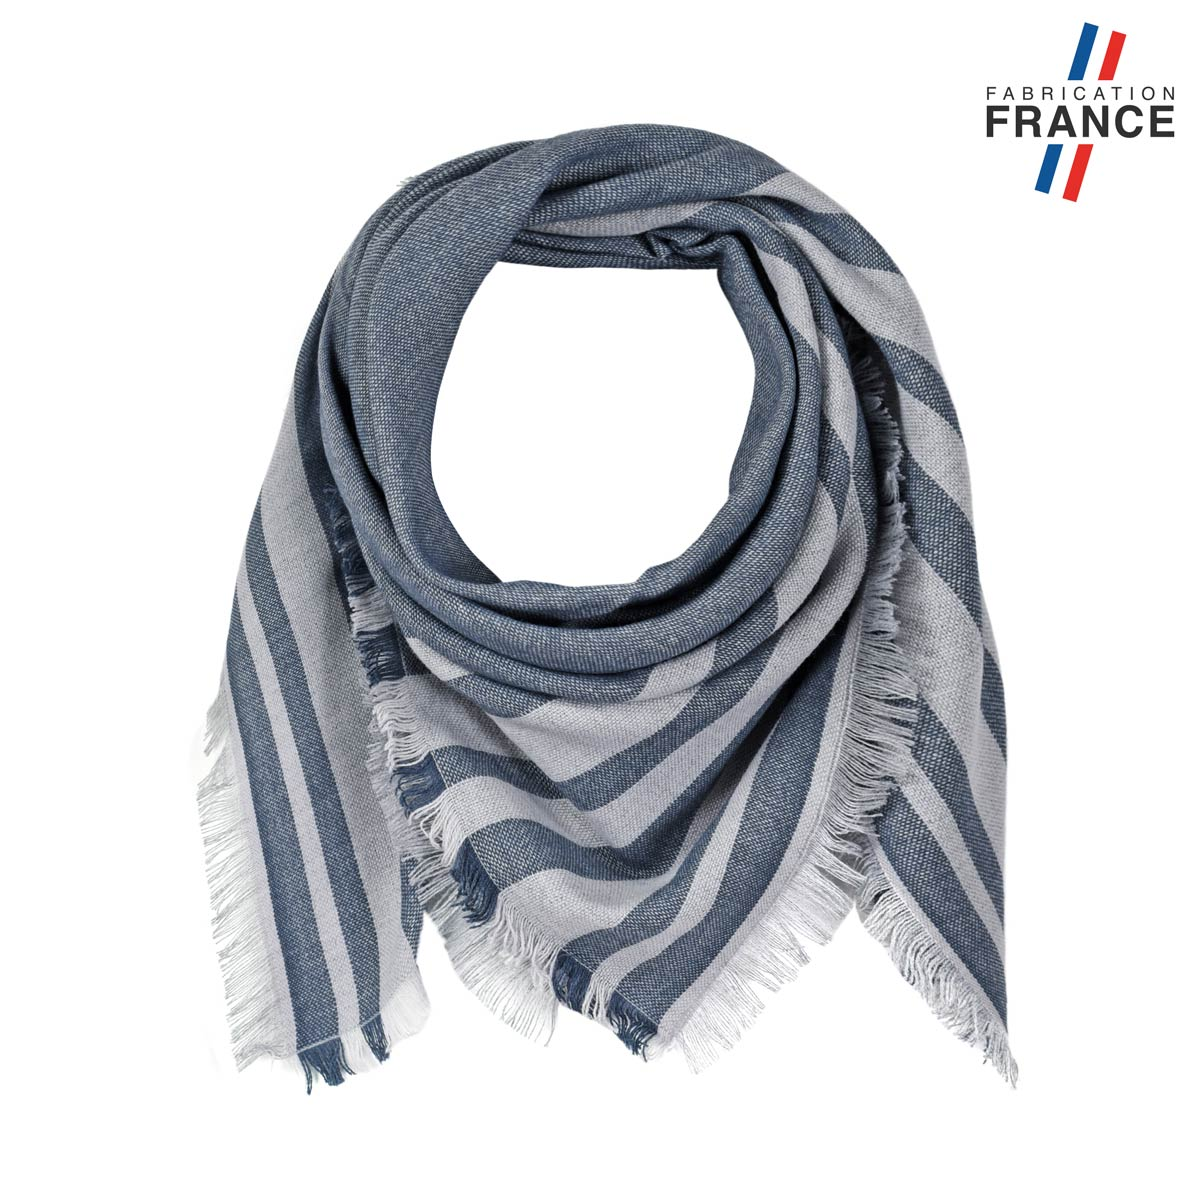 AT-05822_F12-1FR_Echarpe-carre-femme-ardoise-fabrication-francaise